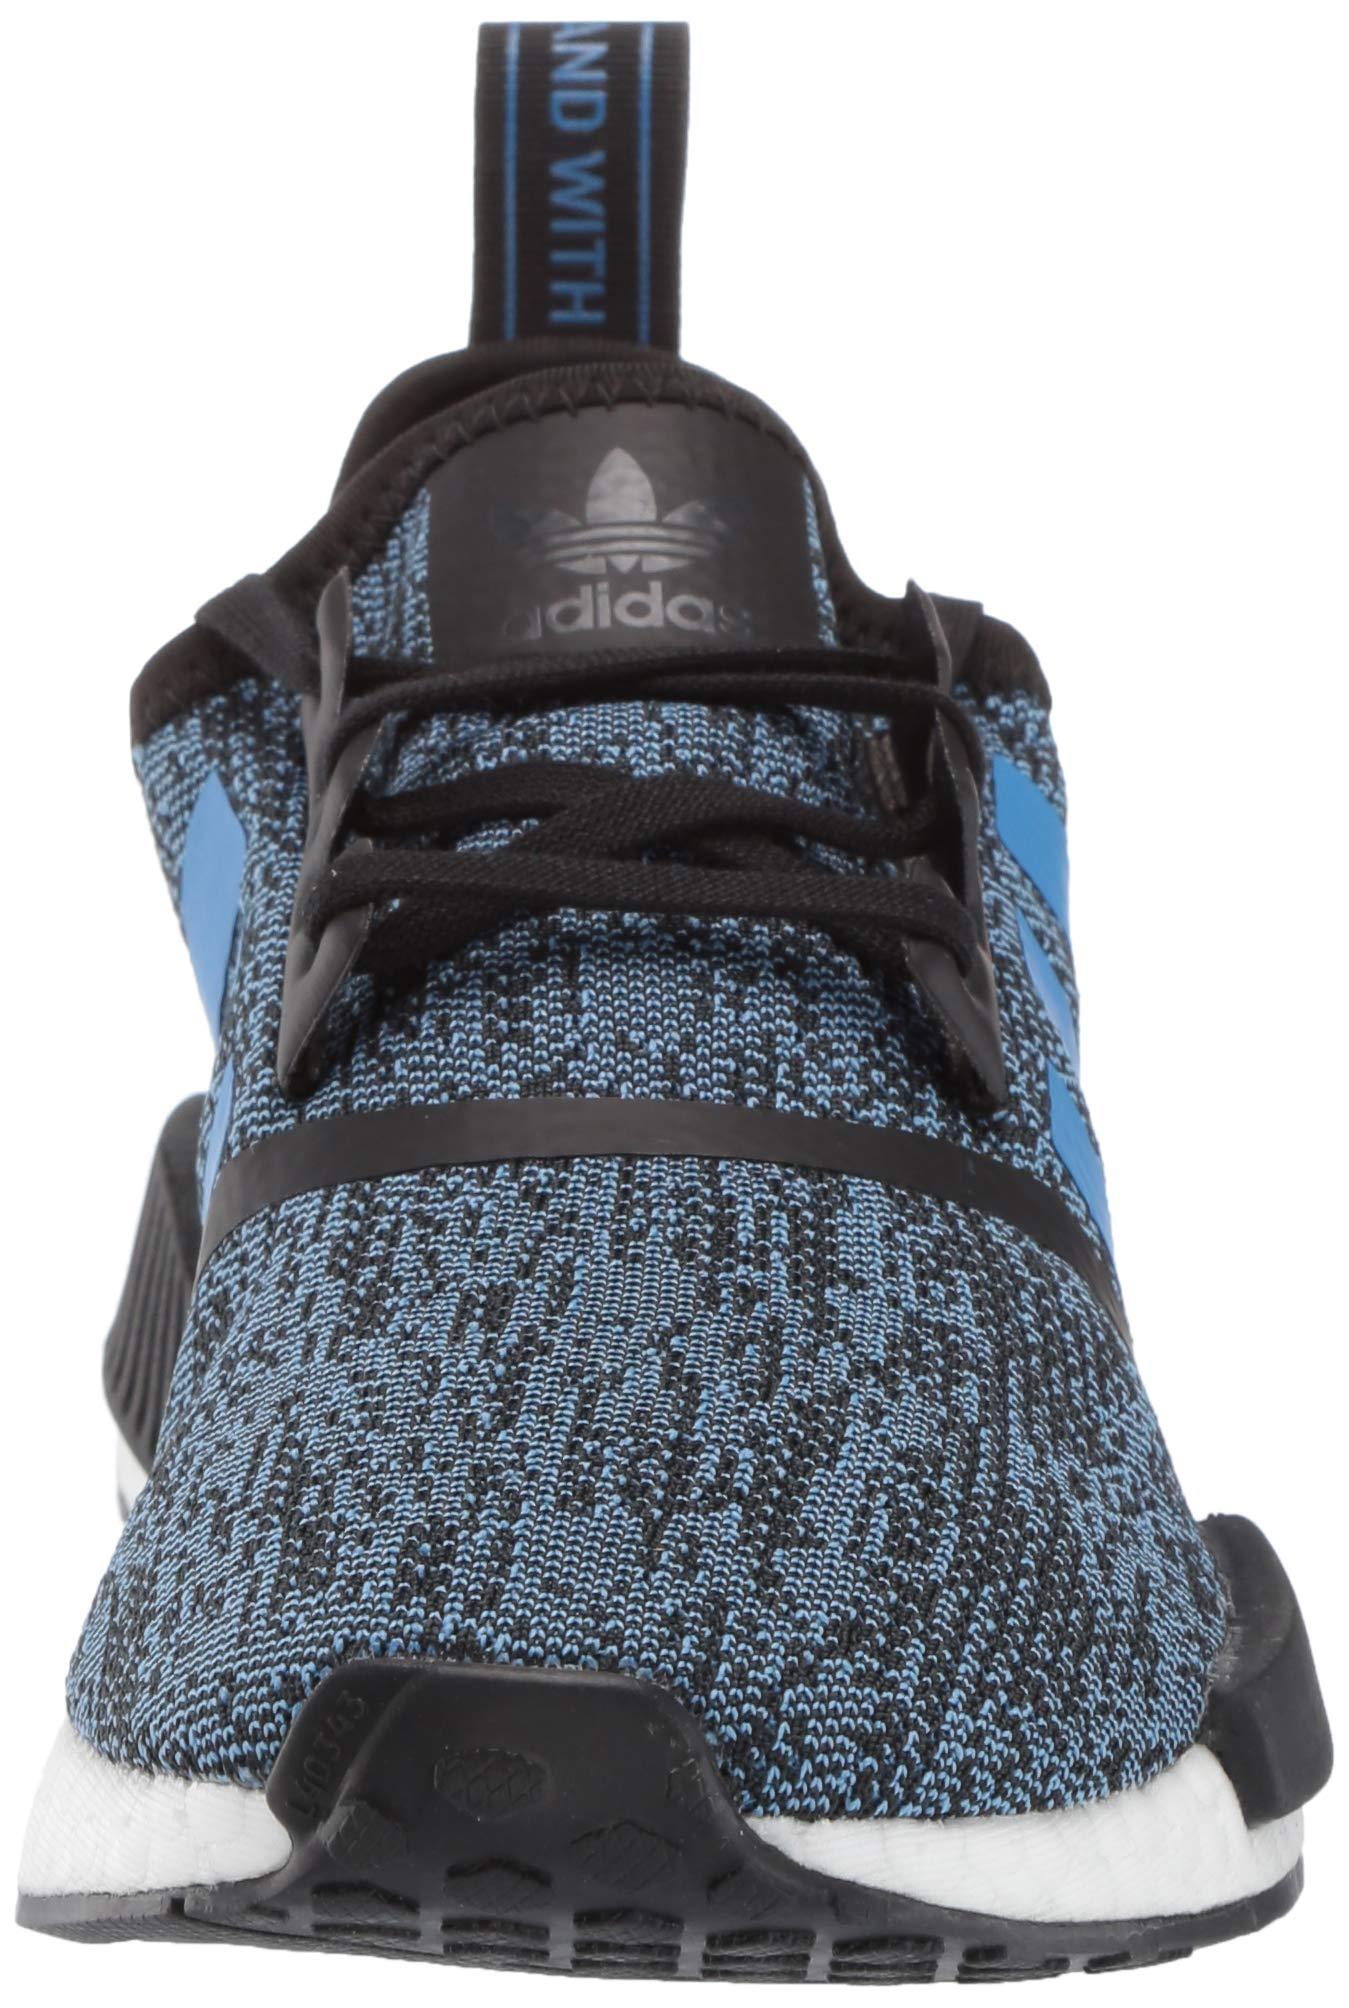 adidas Originals NMD_R1 Running Shoe True Blue/Utility Black, 3.5 M US Big Kid by adidas Originals (Image #4)